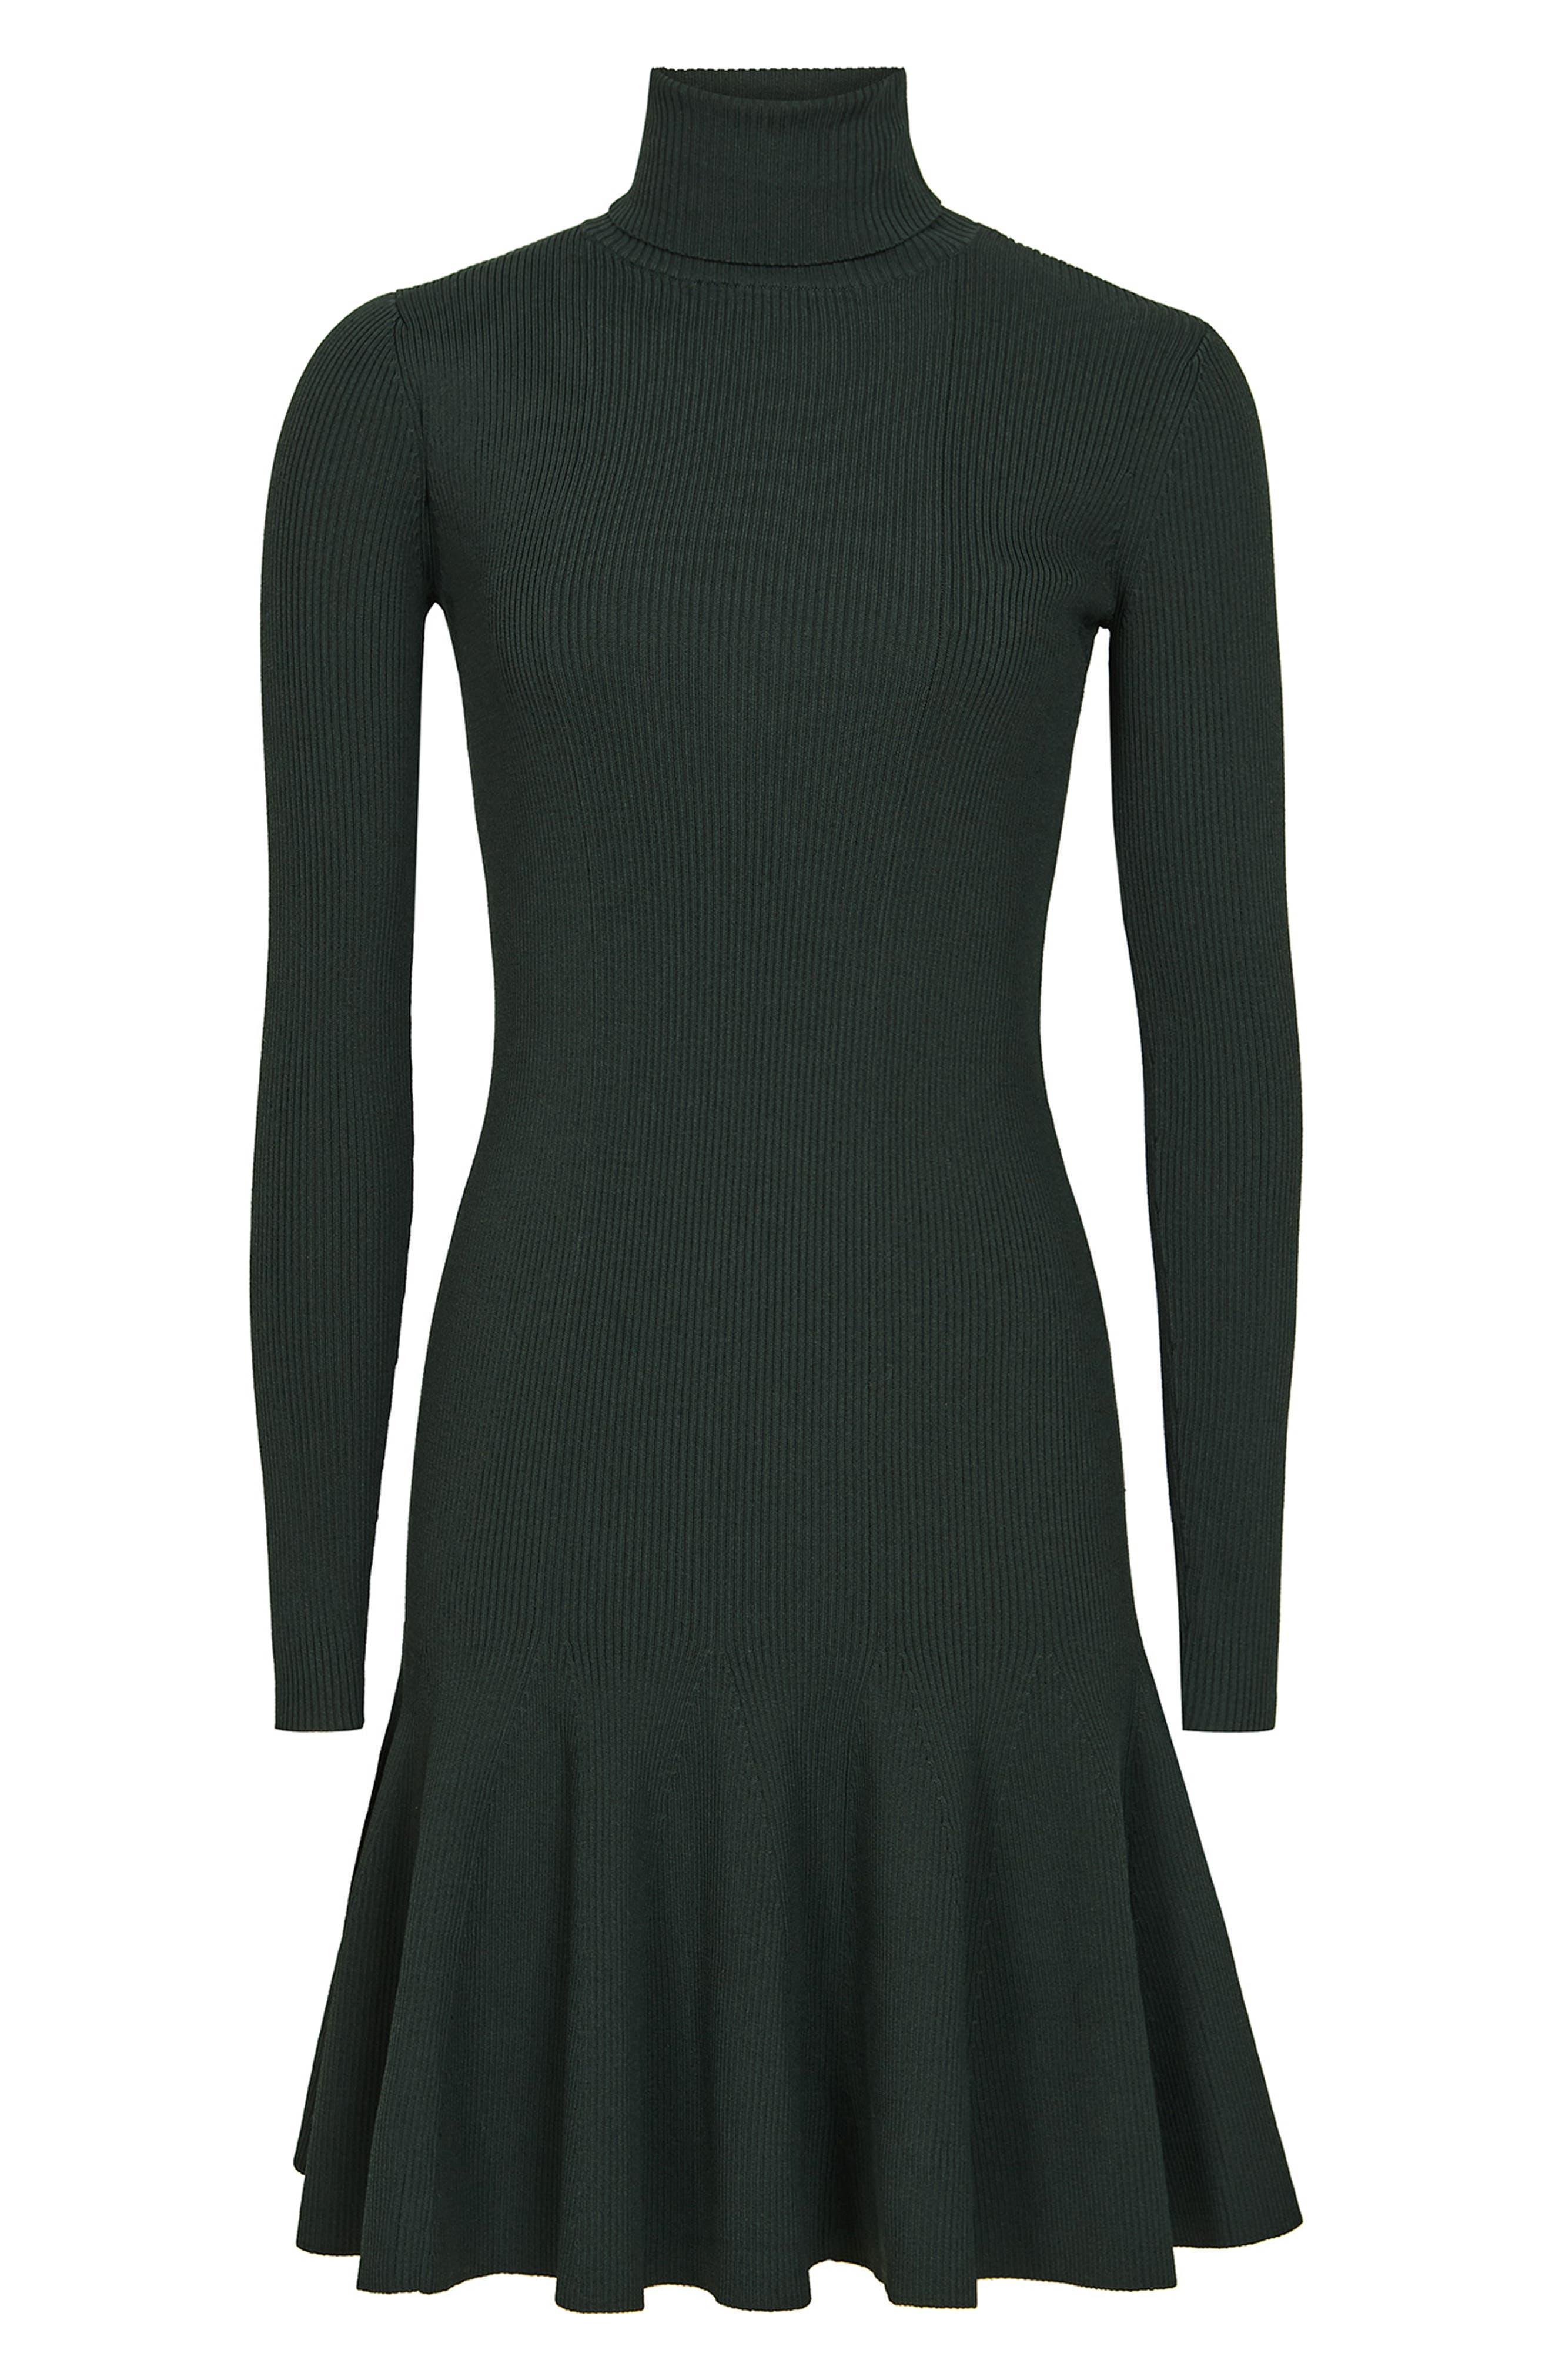 REISS,                             Mimi Turtleneck Sweater Dress,                             Alternate thumbnail 4, color,                             GREEN